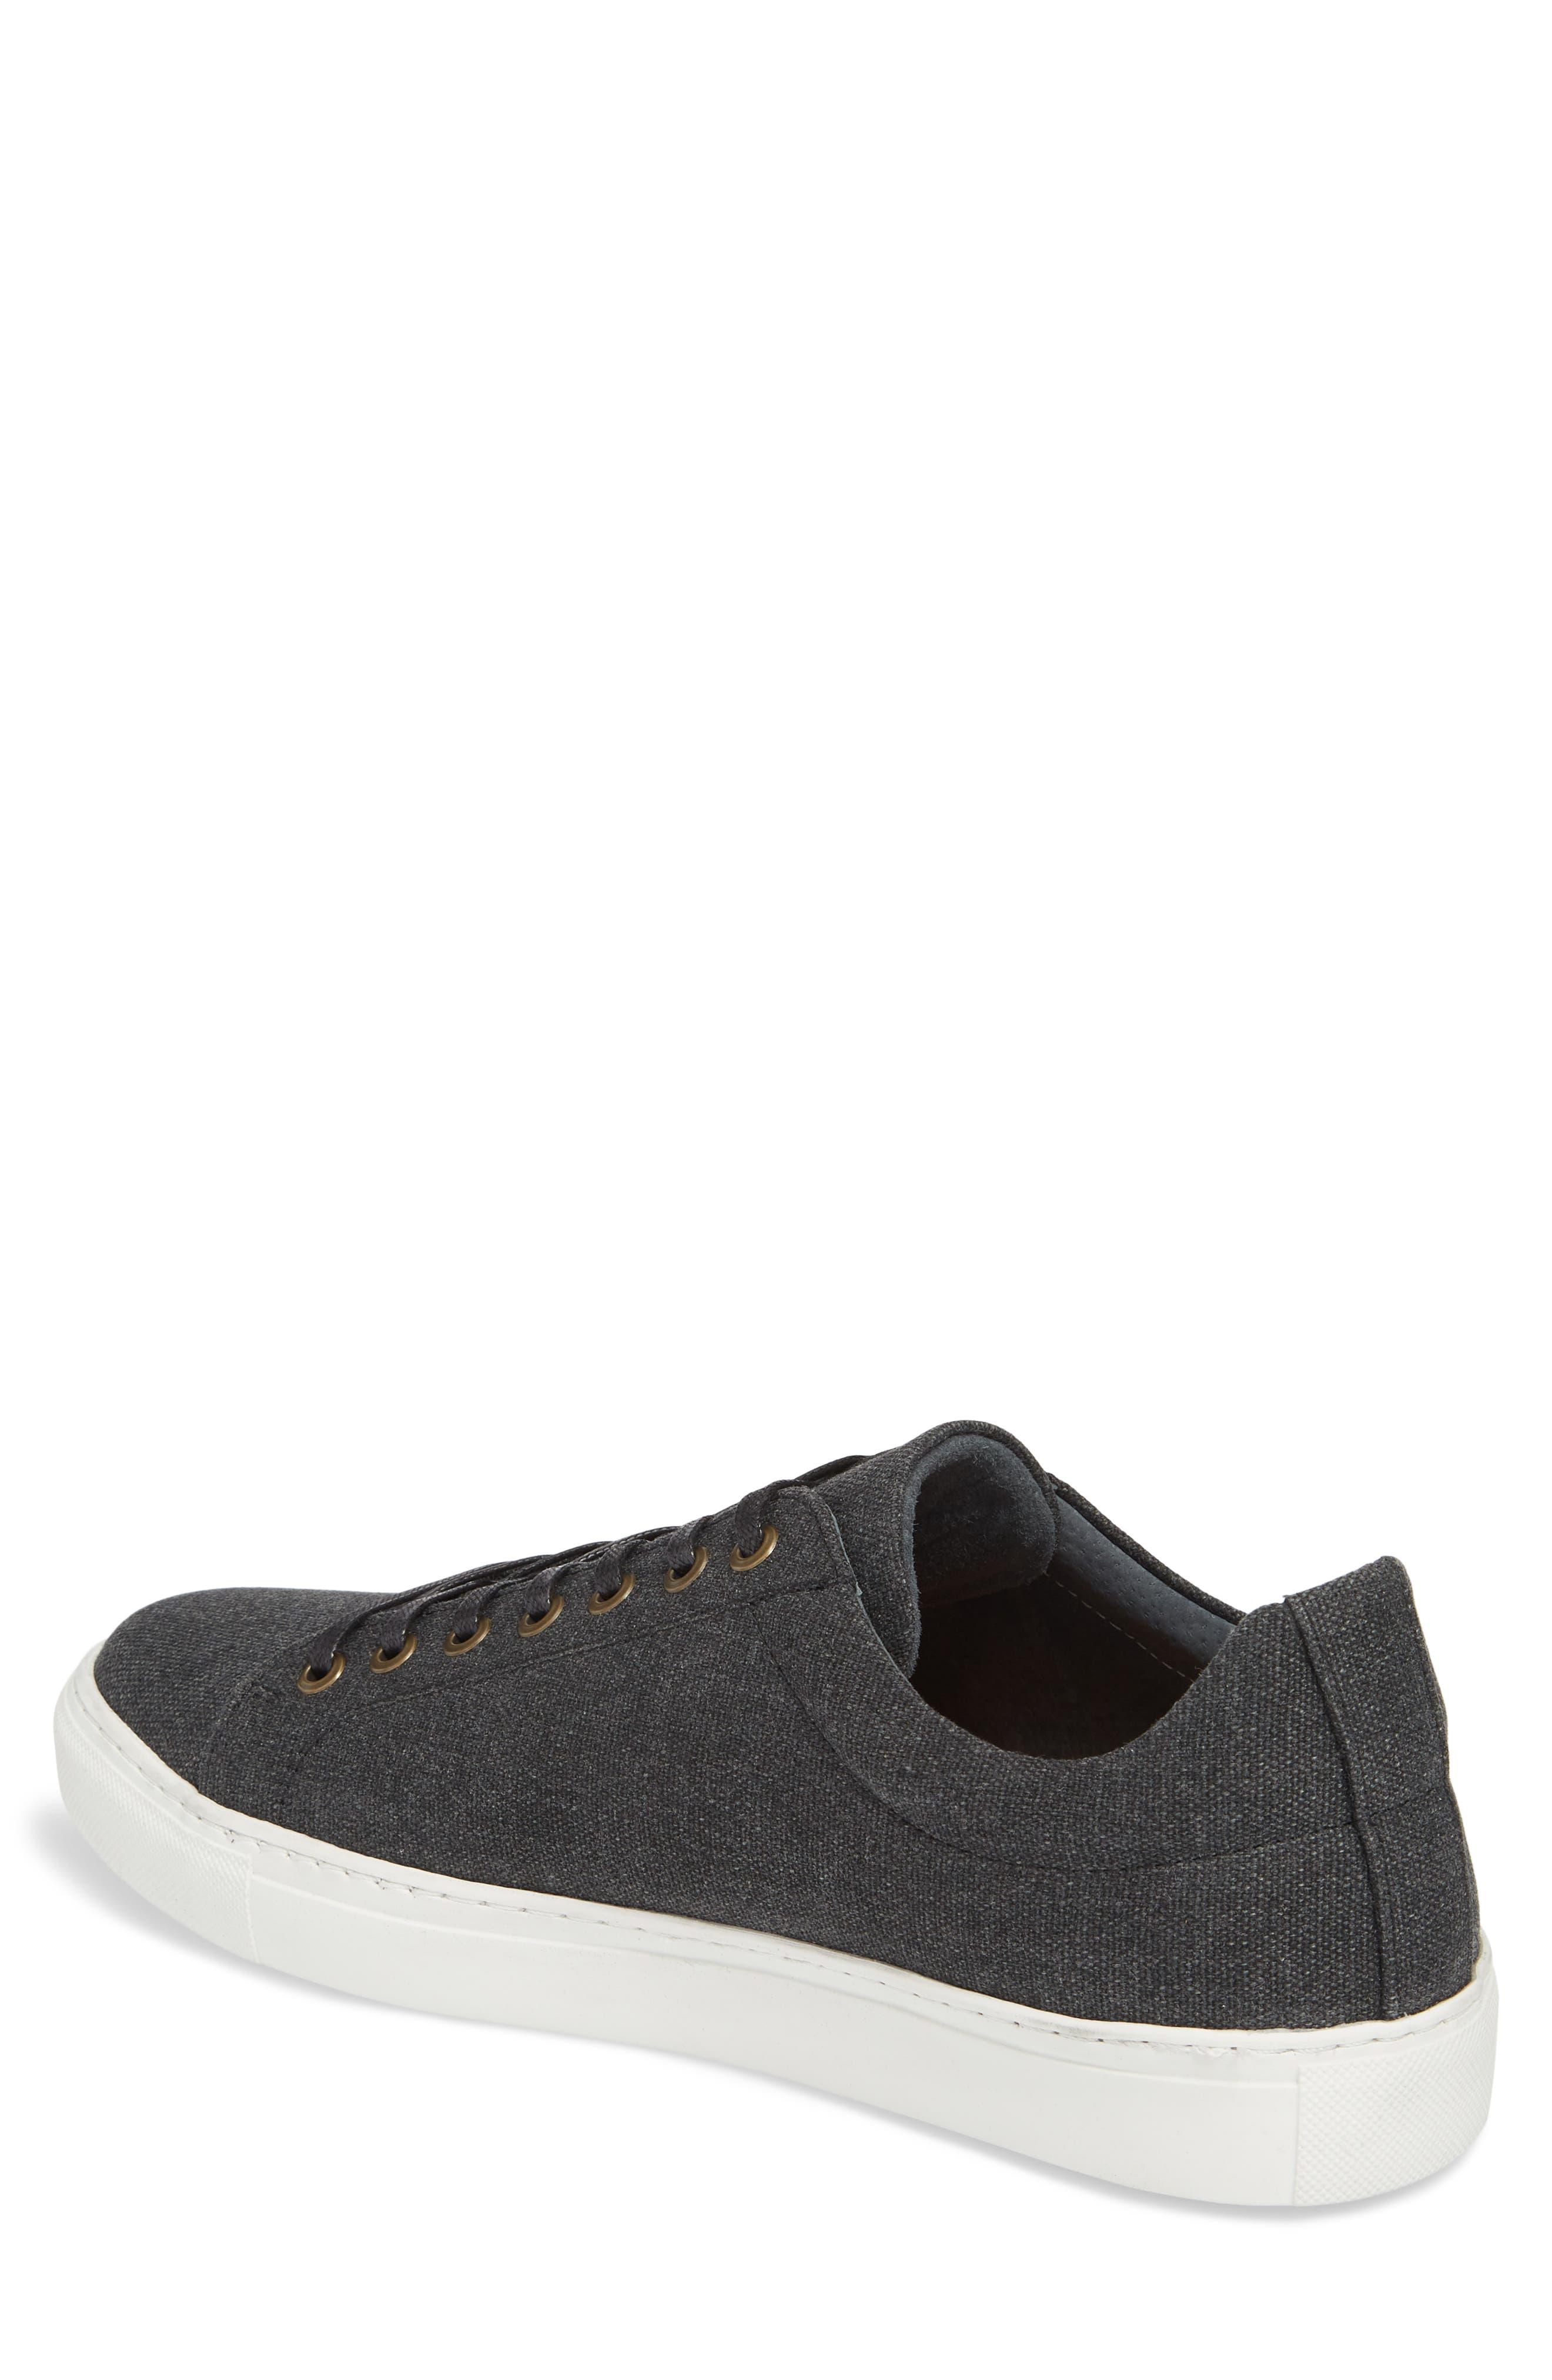 Mark Low Top Sneaker,                             Alternate thumbnail 2, color,                             Black Canvas